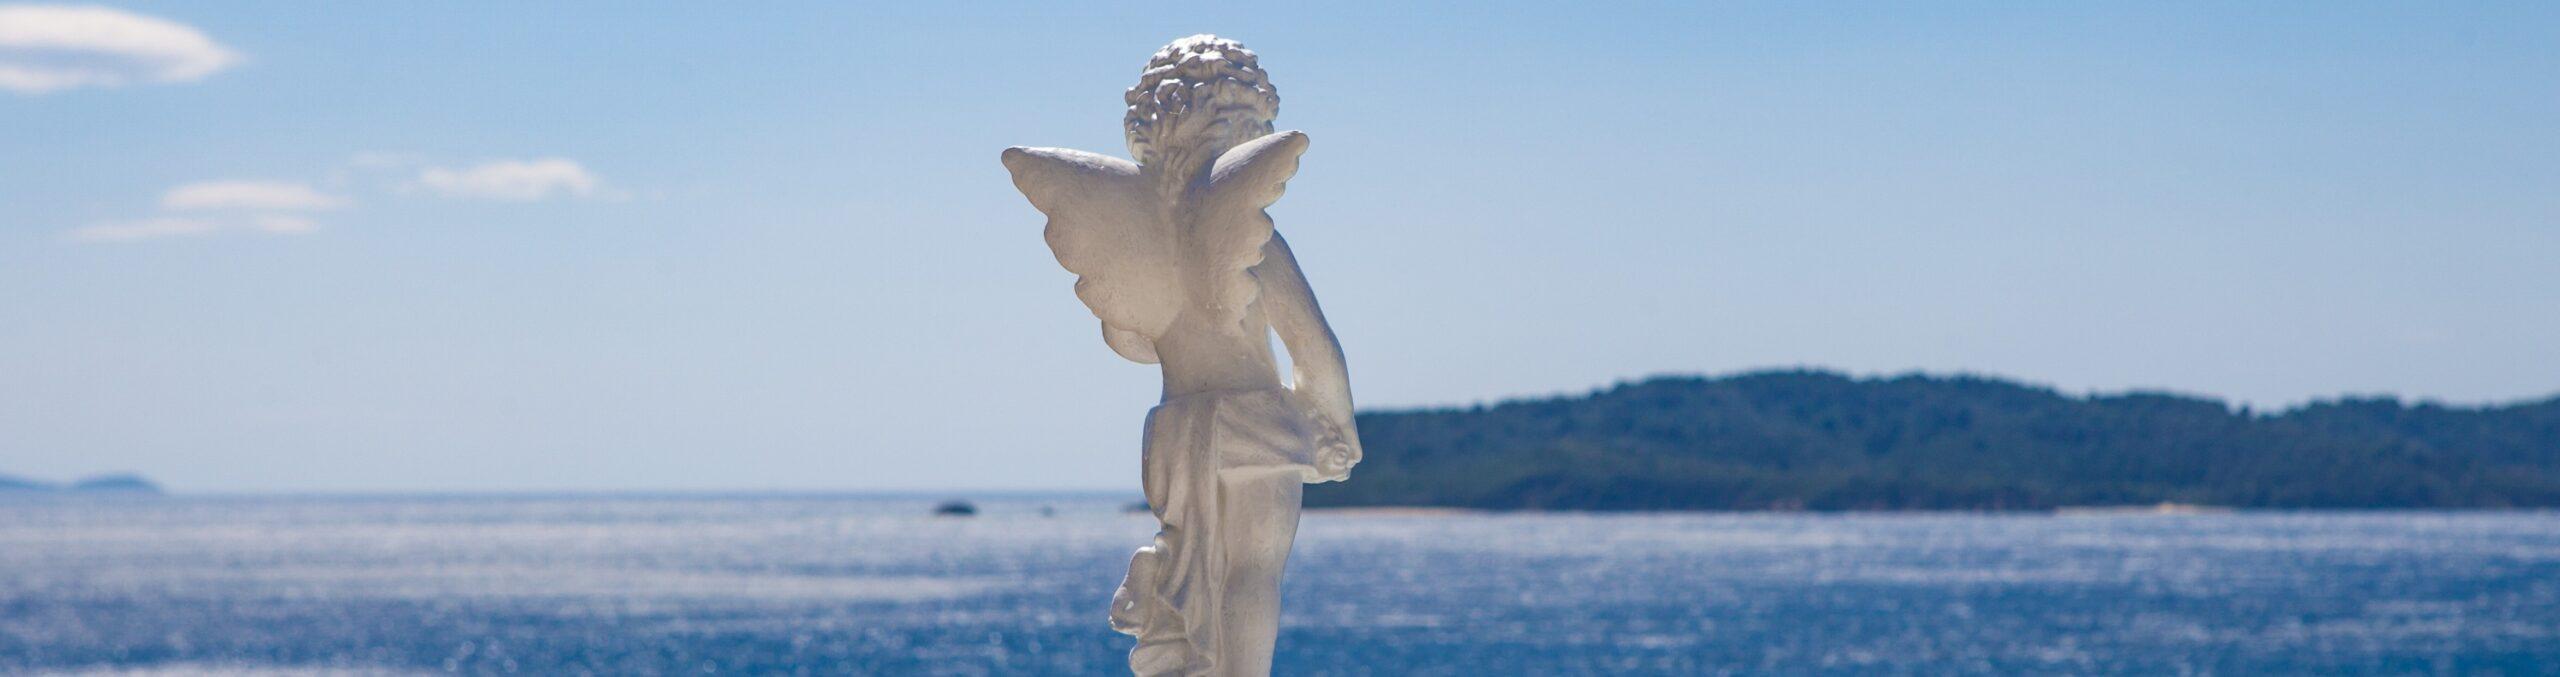 vsi-imamo-svojega-angela-vedezevalka-duska-portal8-si